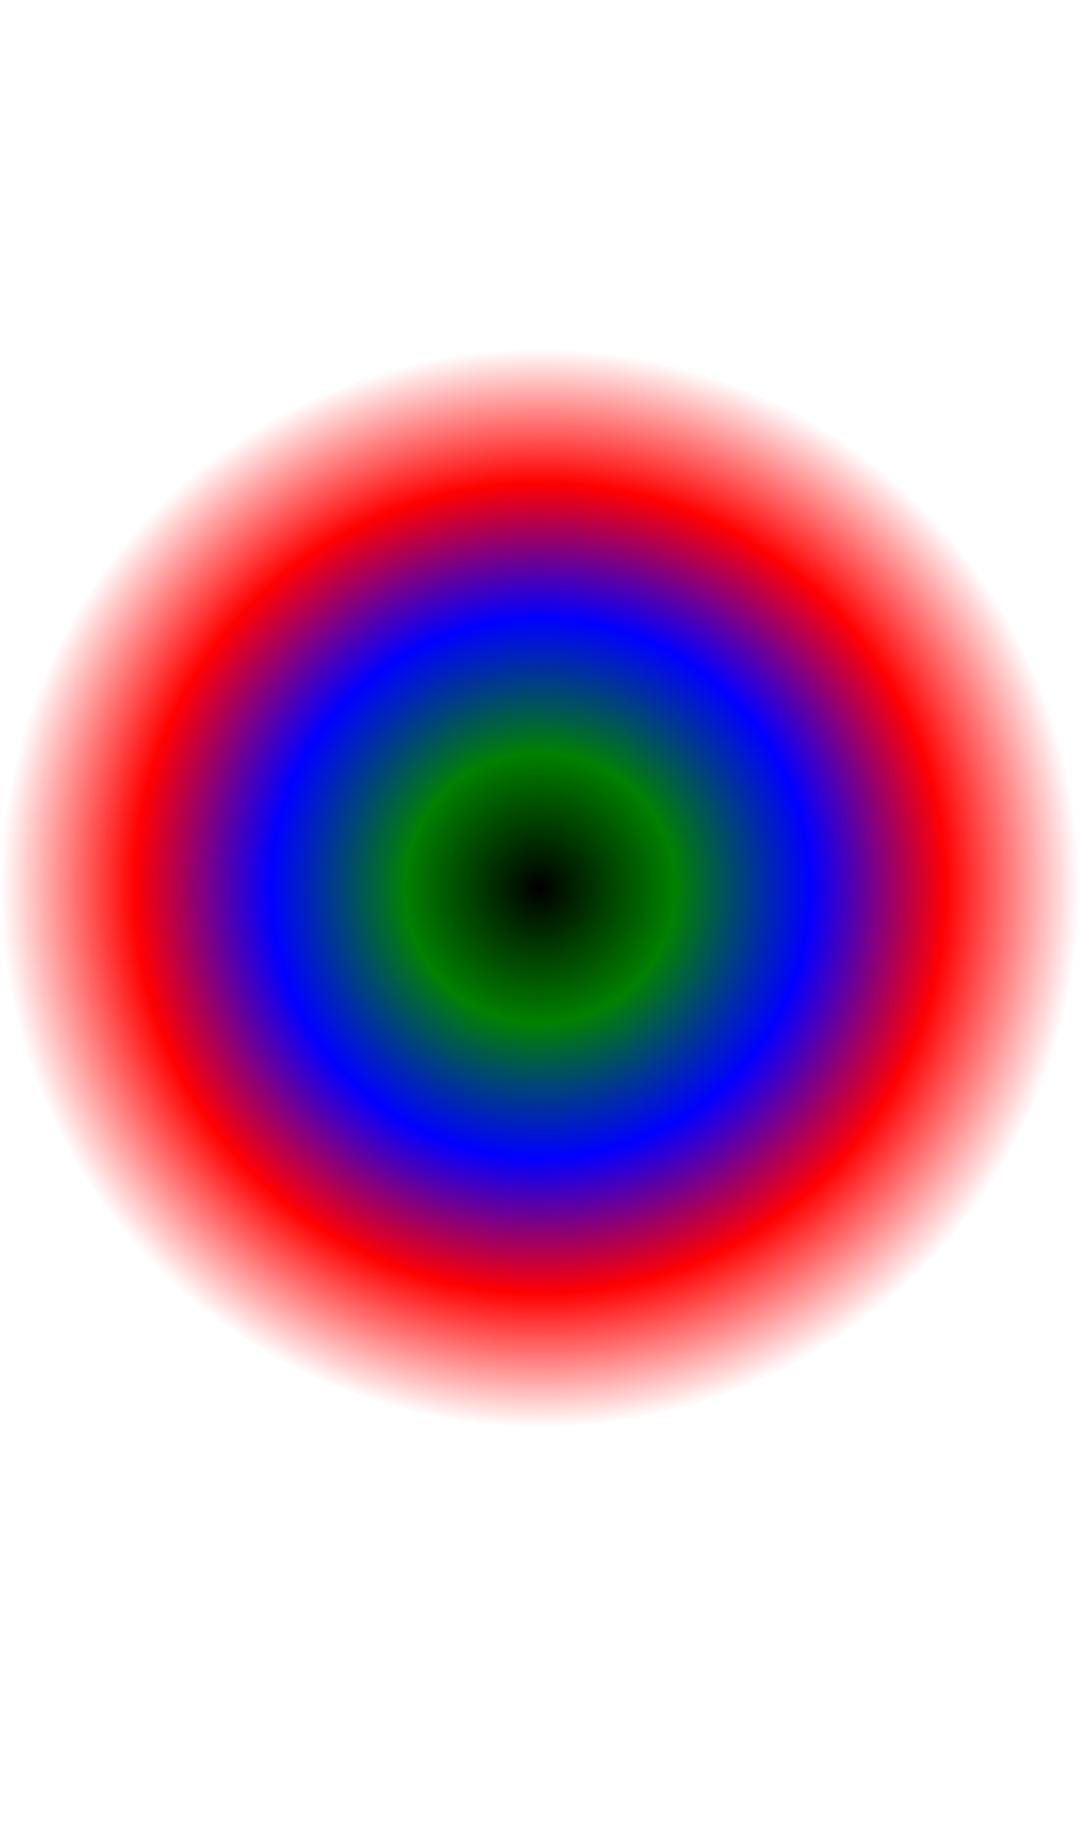 What Is Radial Balance In Art: Surajitsarkar19/react-native-radial-gradient